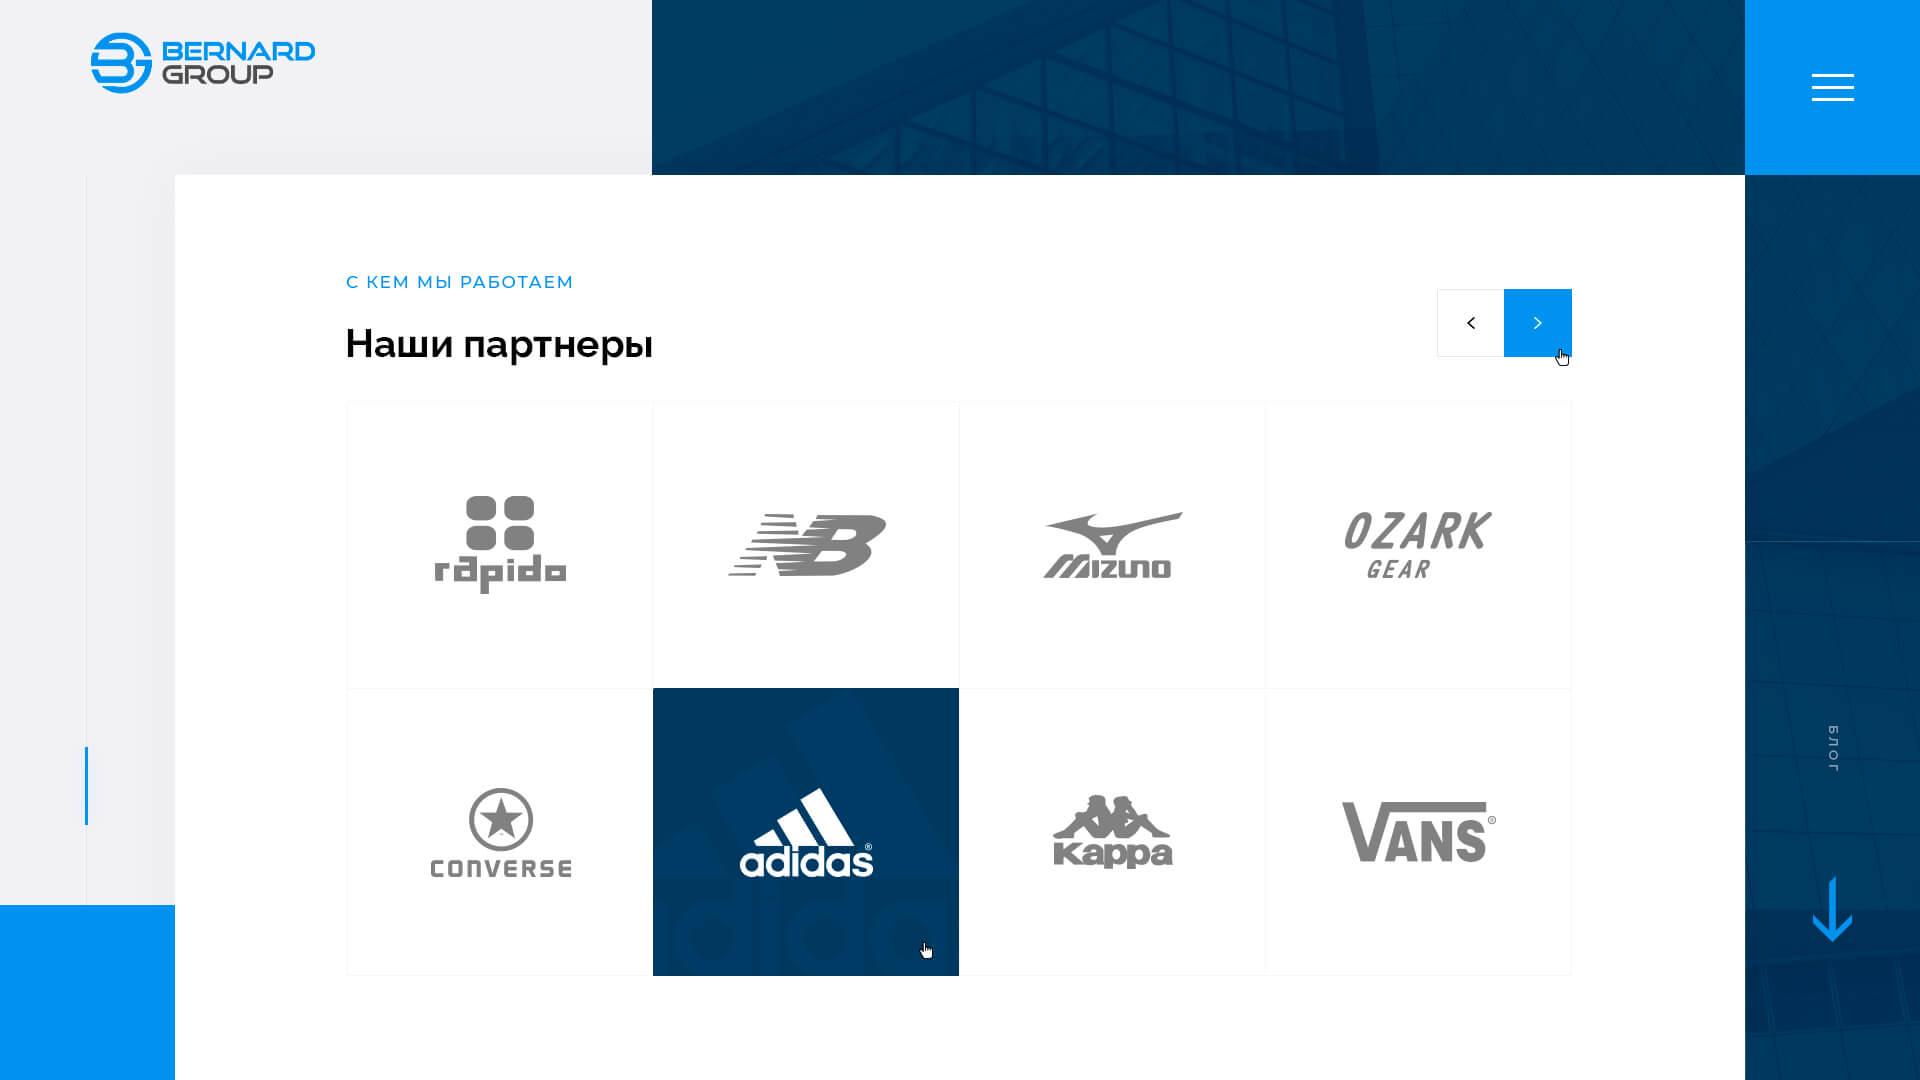 Bernard_Group_10_Partners_Page_1.0